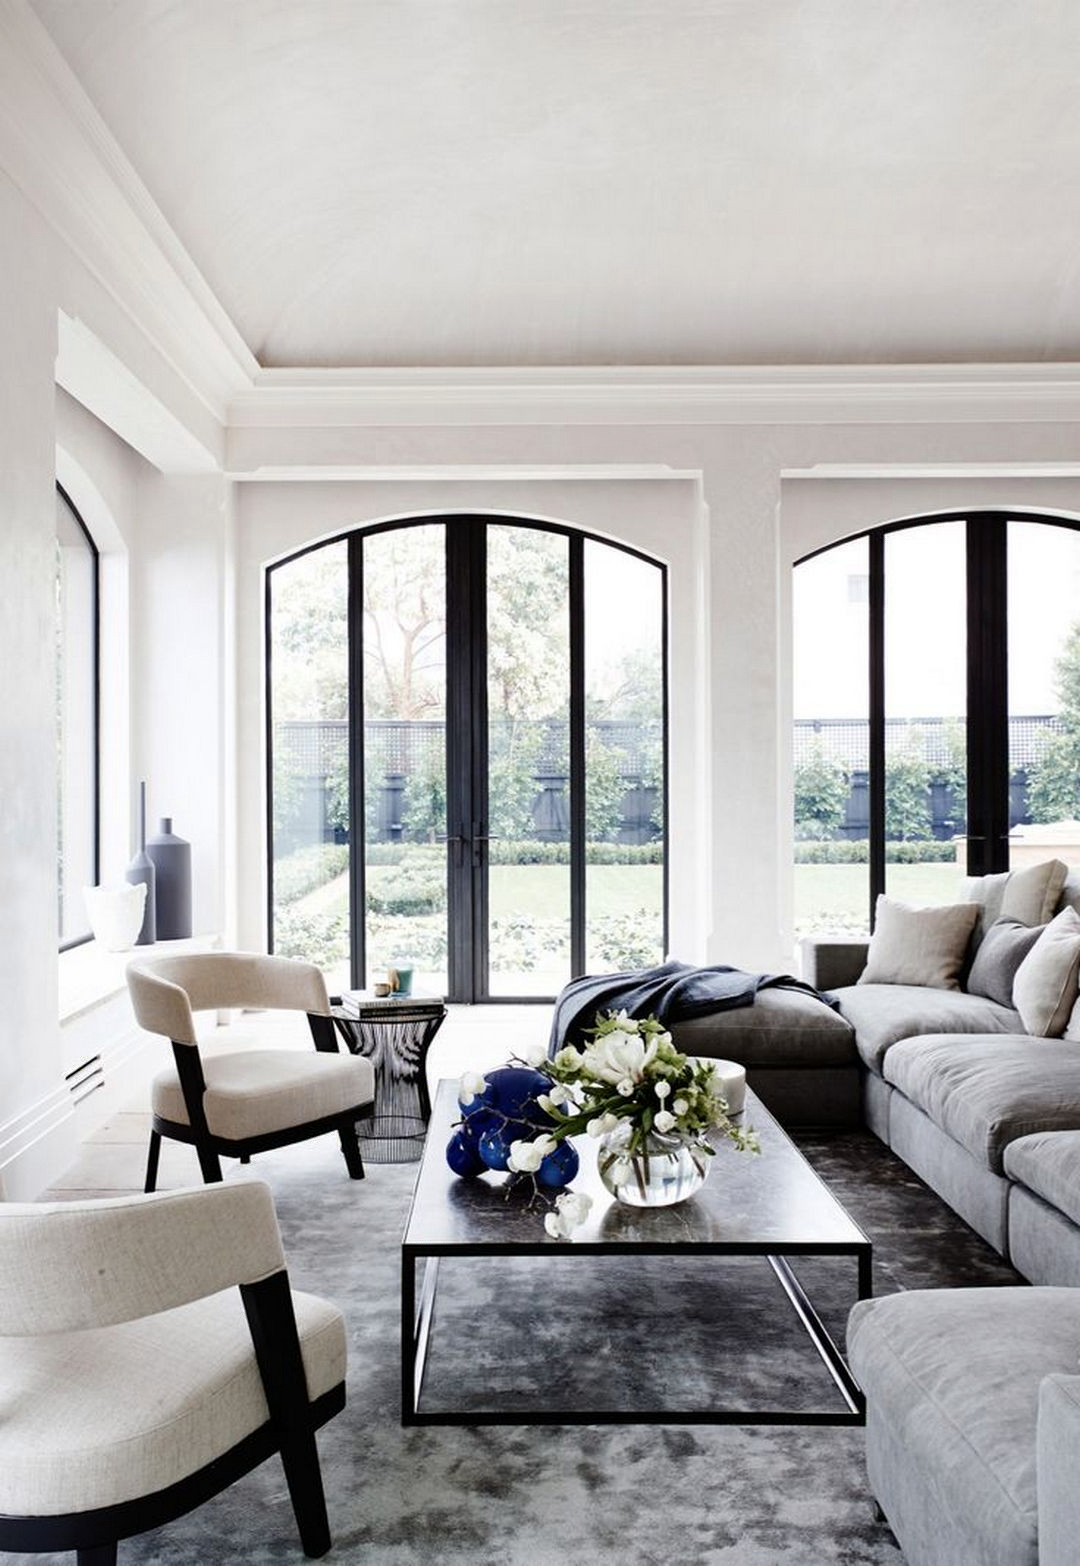 3 Simple Interior Design Ideas For Living Room Contemporary Dining Room Design Living Room Design Modern Elegant Living Room Modern elegant living room